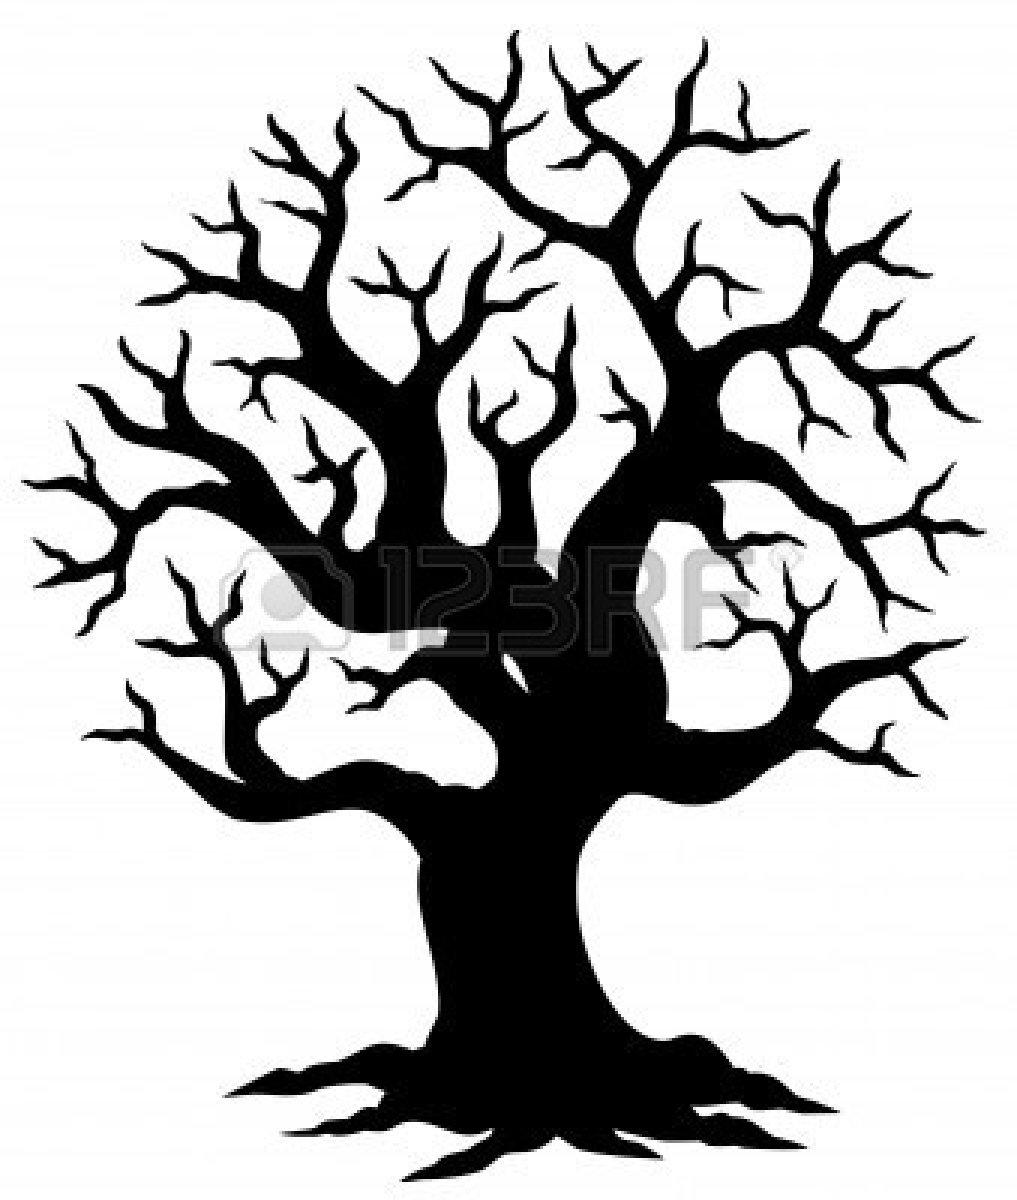 art-family-tree-outline-christmas-tree-outline-clip-art-hollow-tree ...